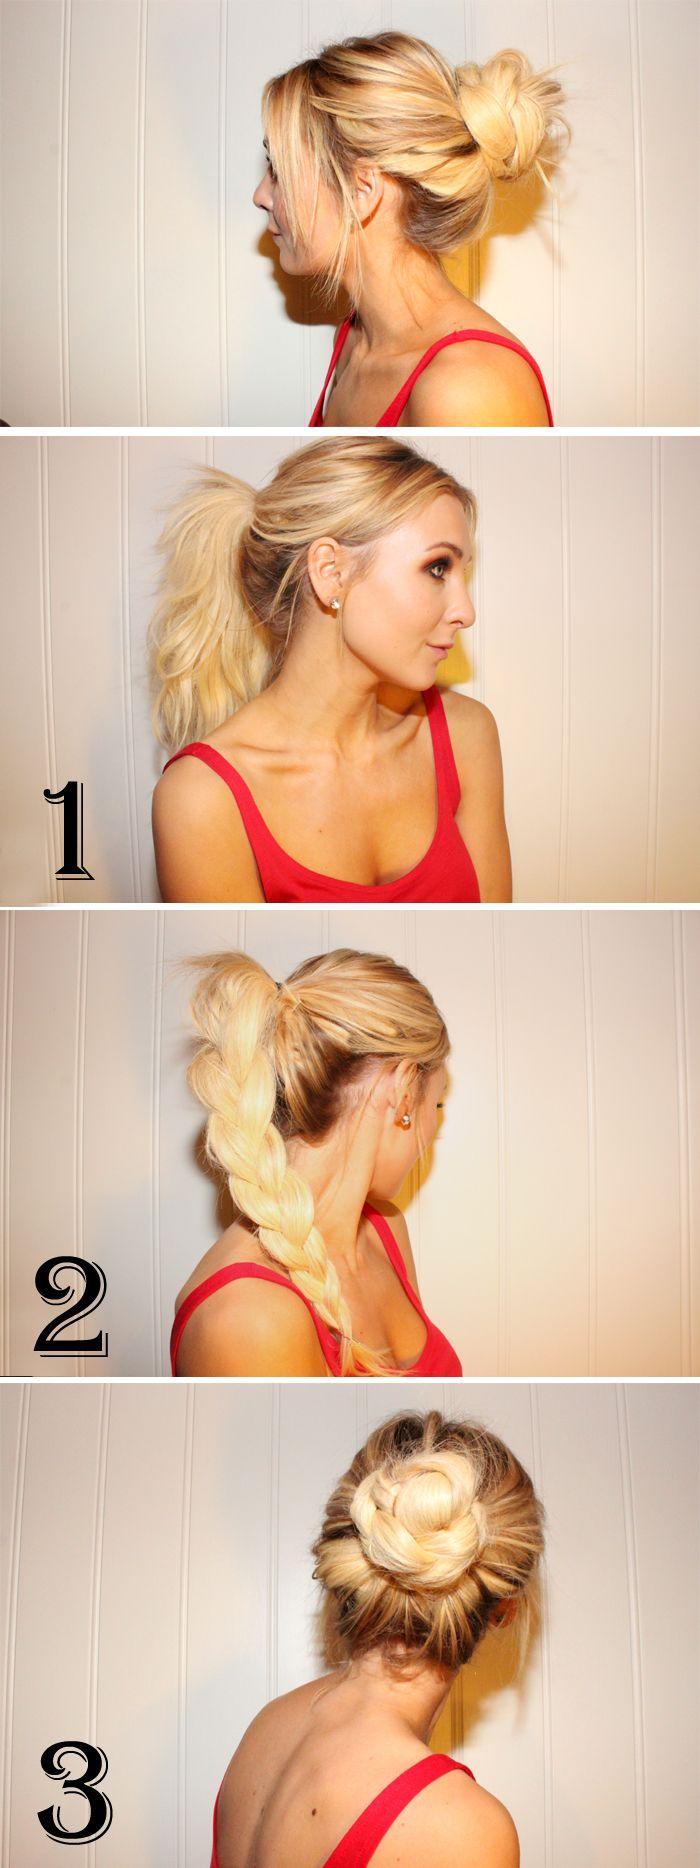 Hairbun. So simple!